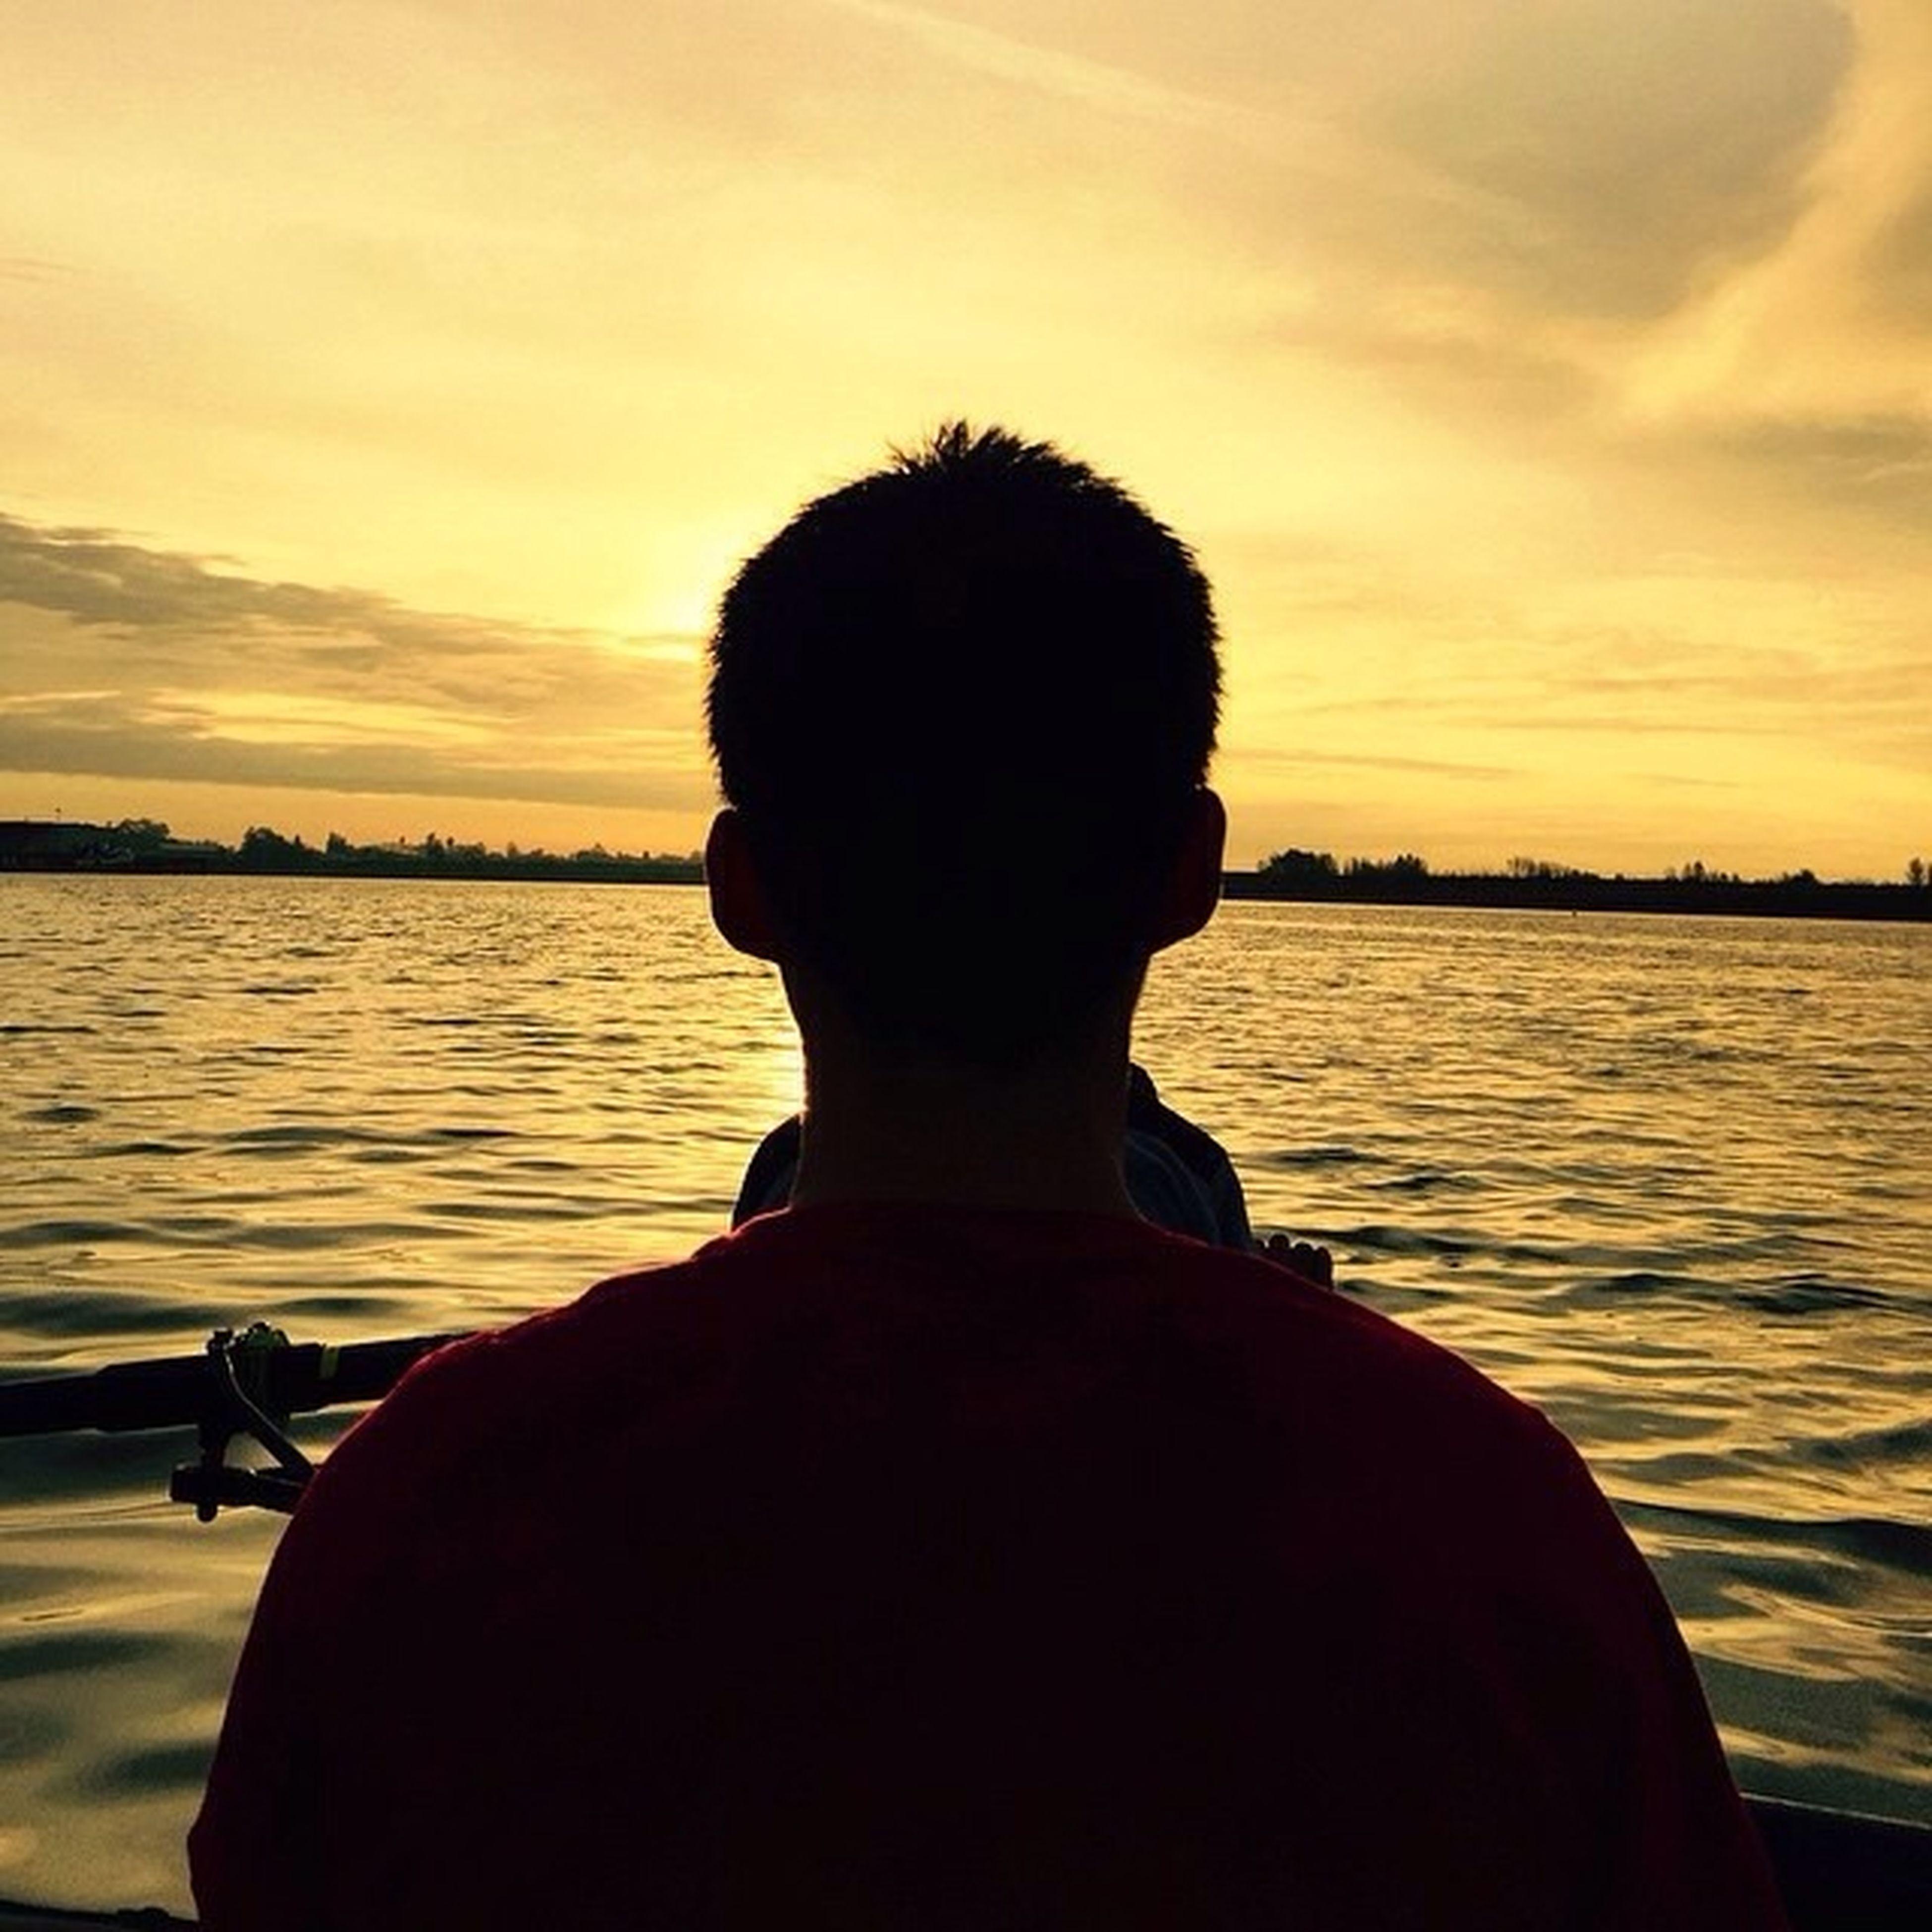 sunset, water, sky, silhouette, rear view, cloud - sky, lifestyles, men, leisure activity, sea, orange color, standing, waist up, nautical vessel, scenics, cloud, dusk, sitting